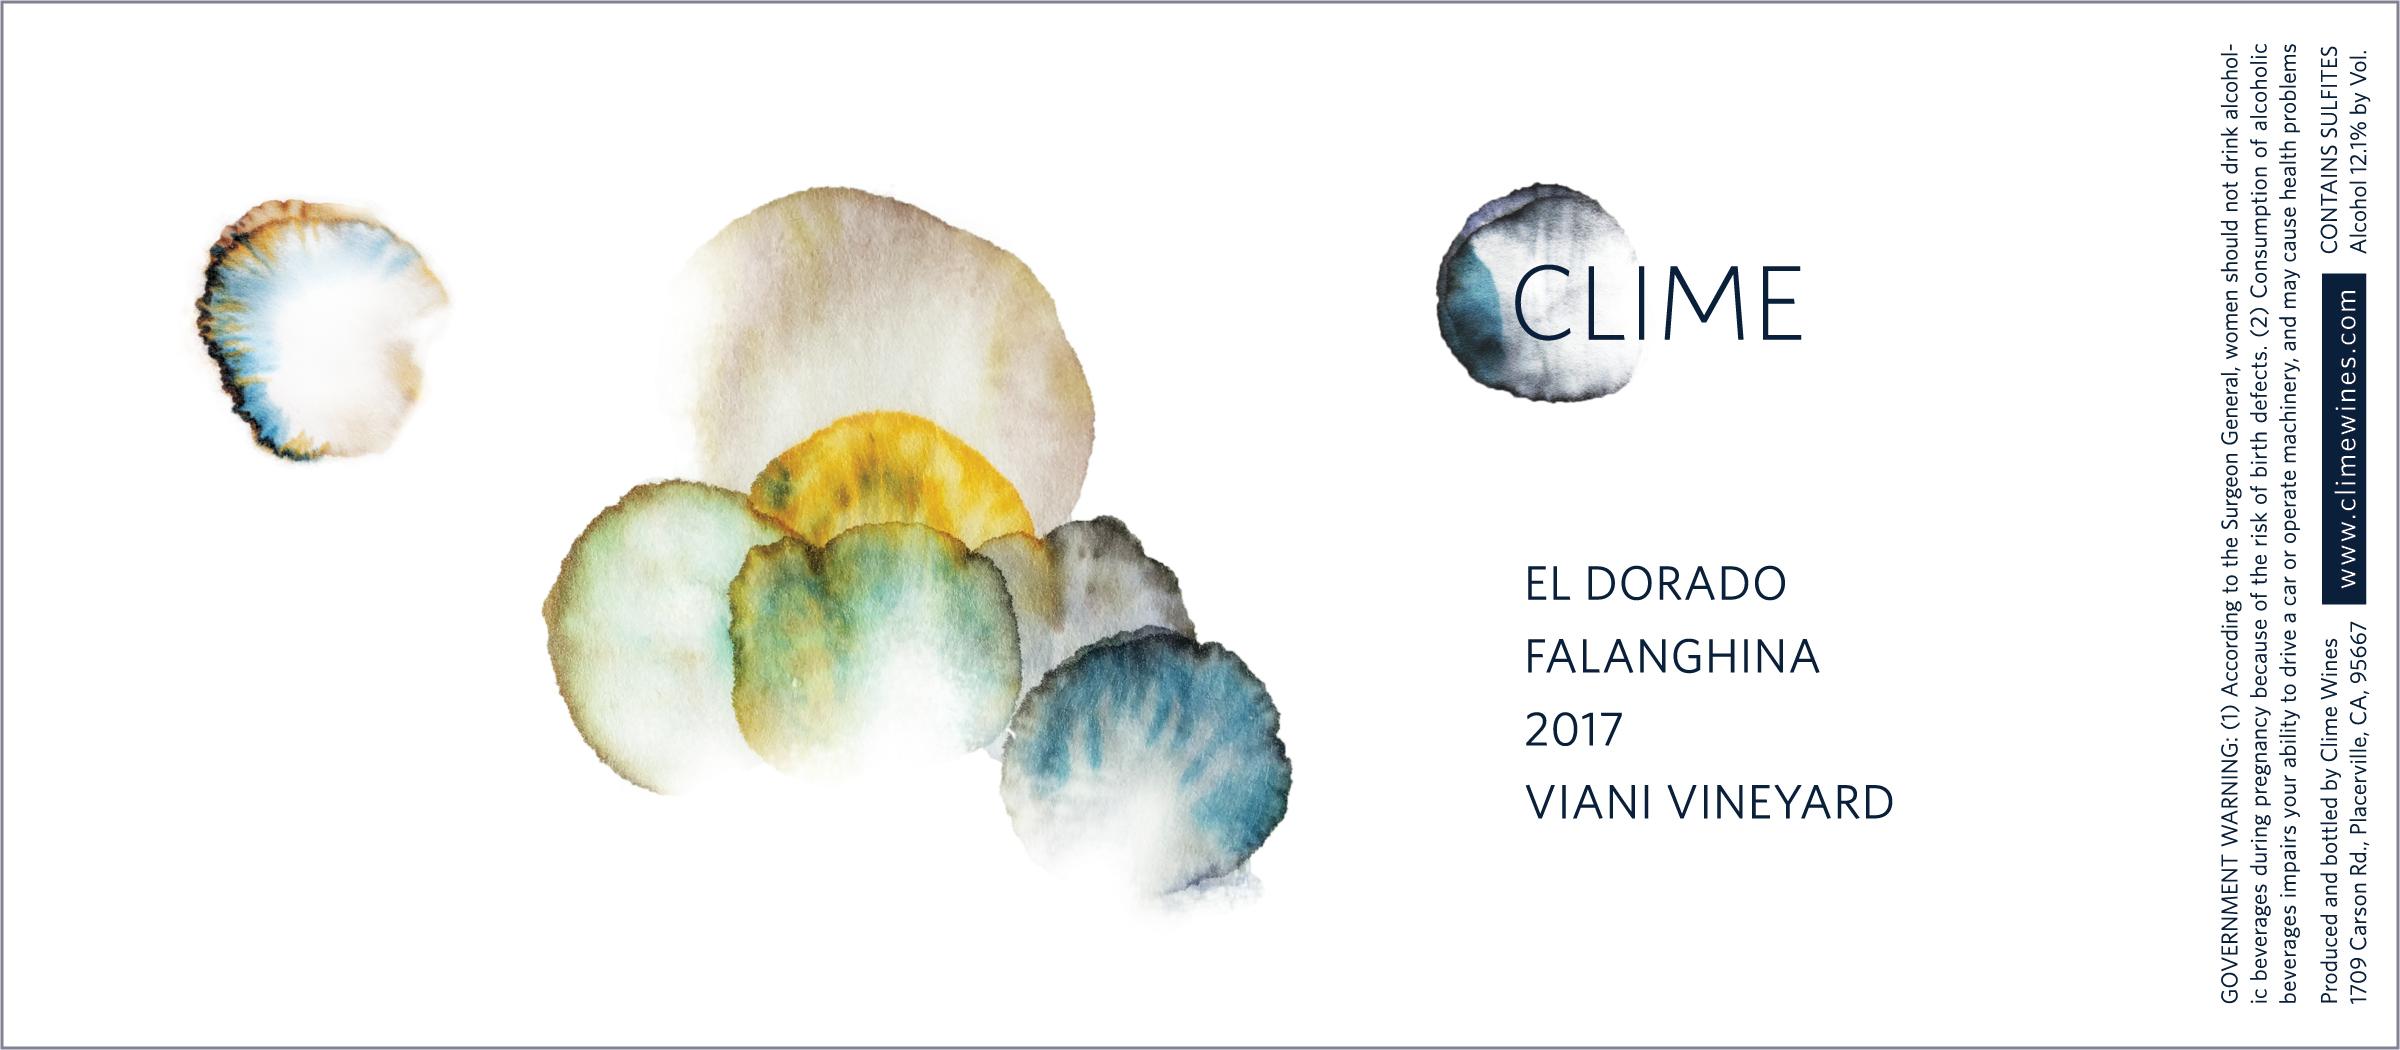 Clime_Label_V.9.J_Edit3.jpg